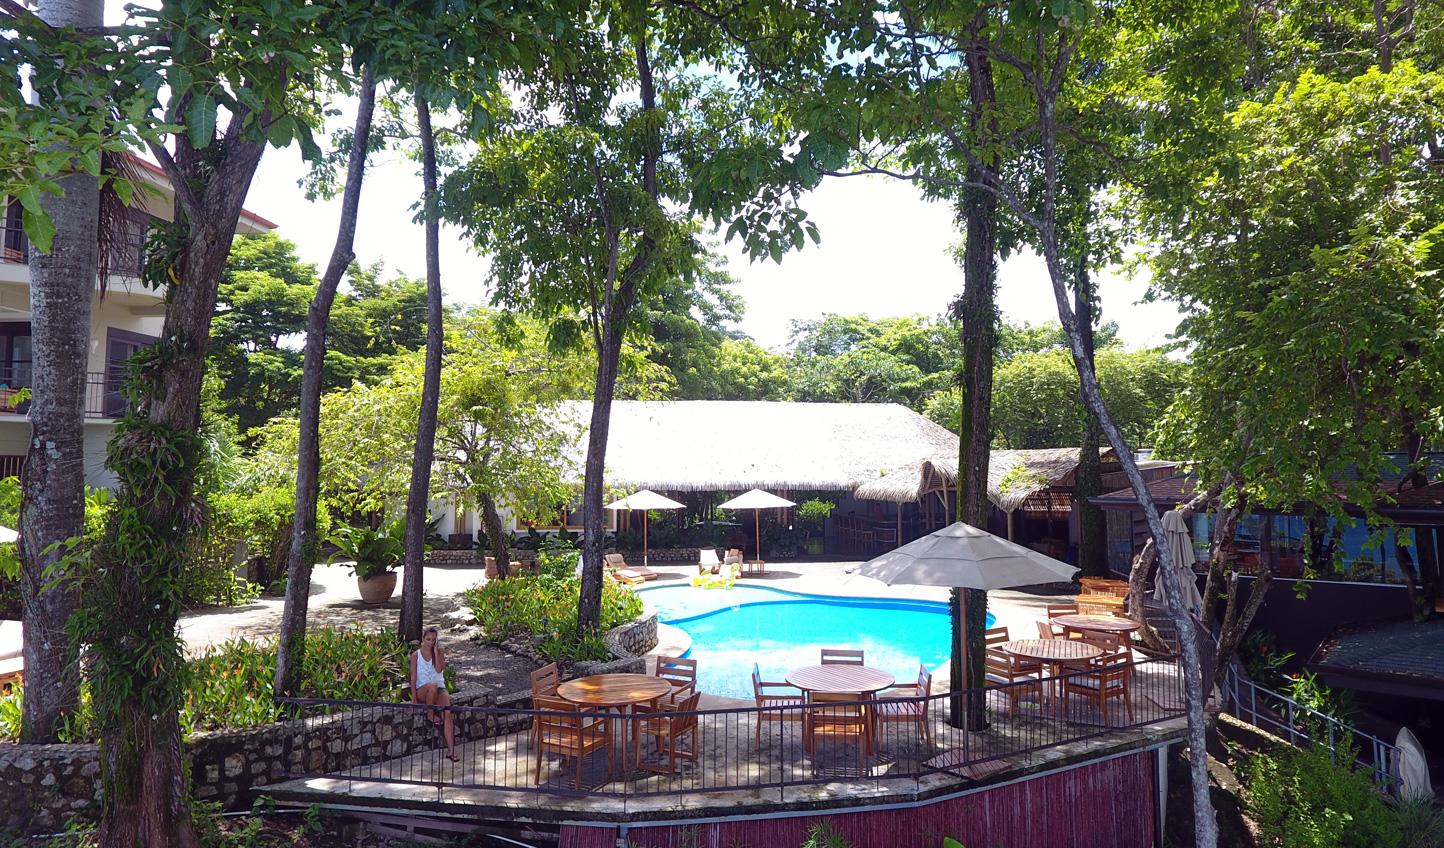 Sunbathe around the pool